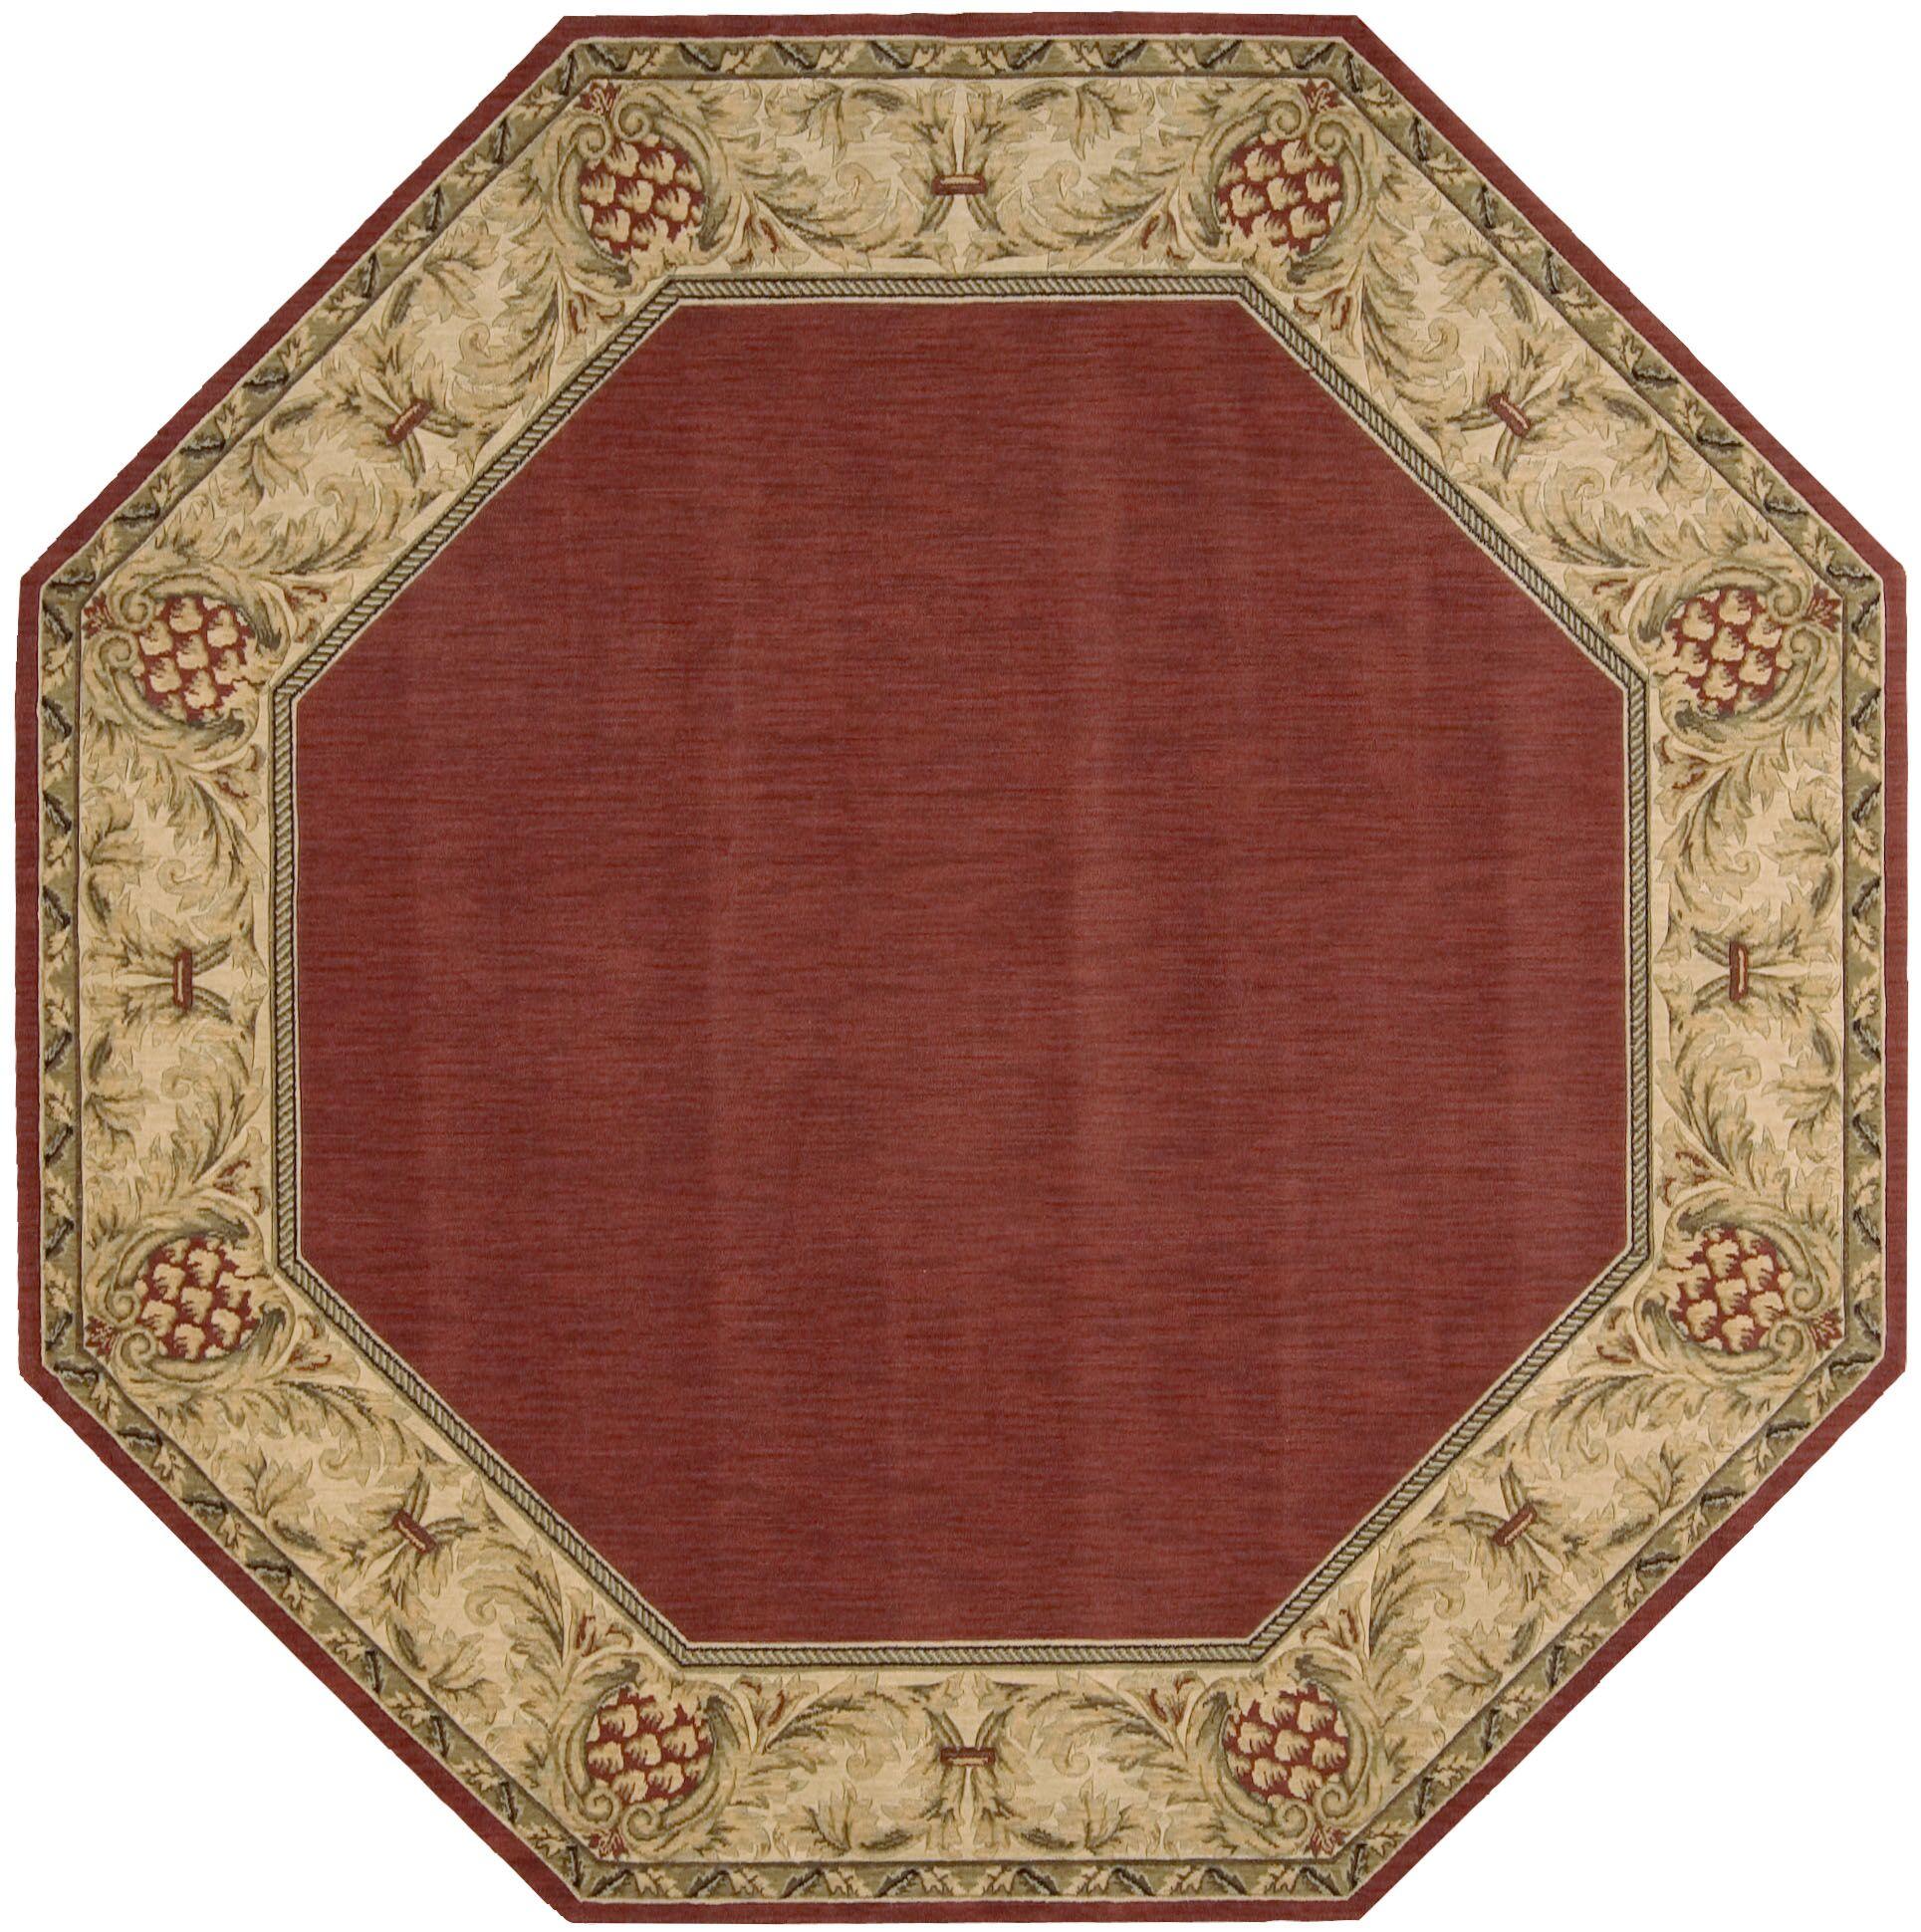 Bebington Wool Brick/Red Area Rug Rug Size: Rectangle 3'6